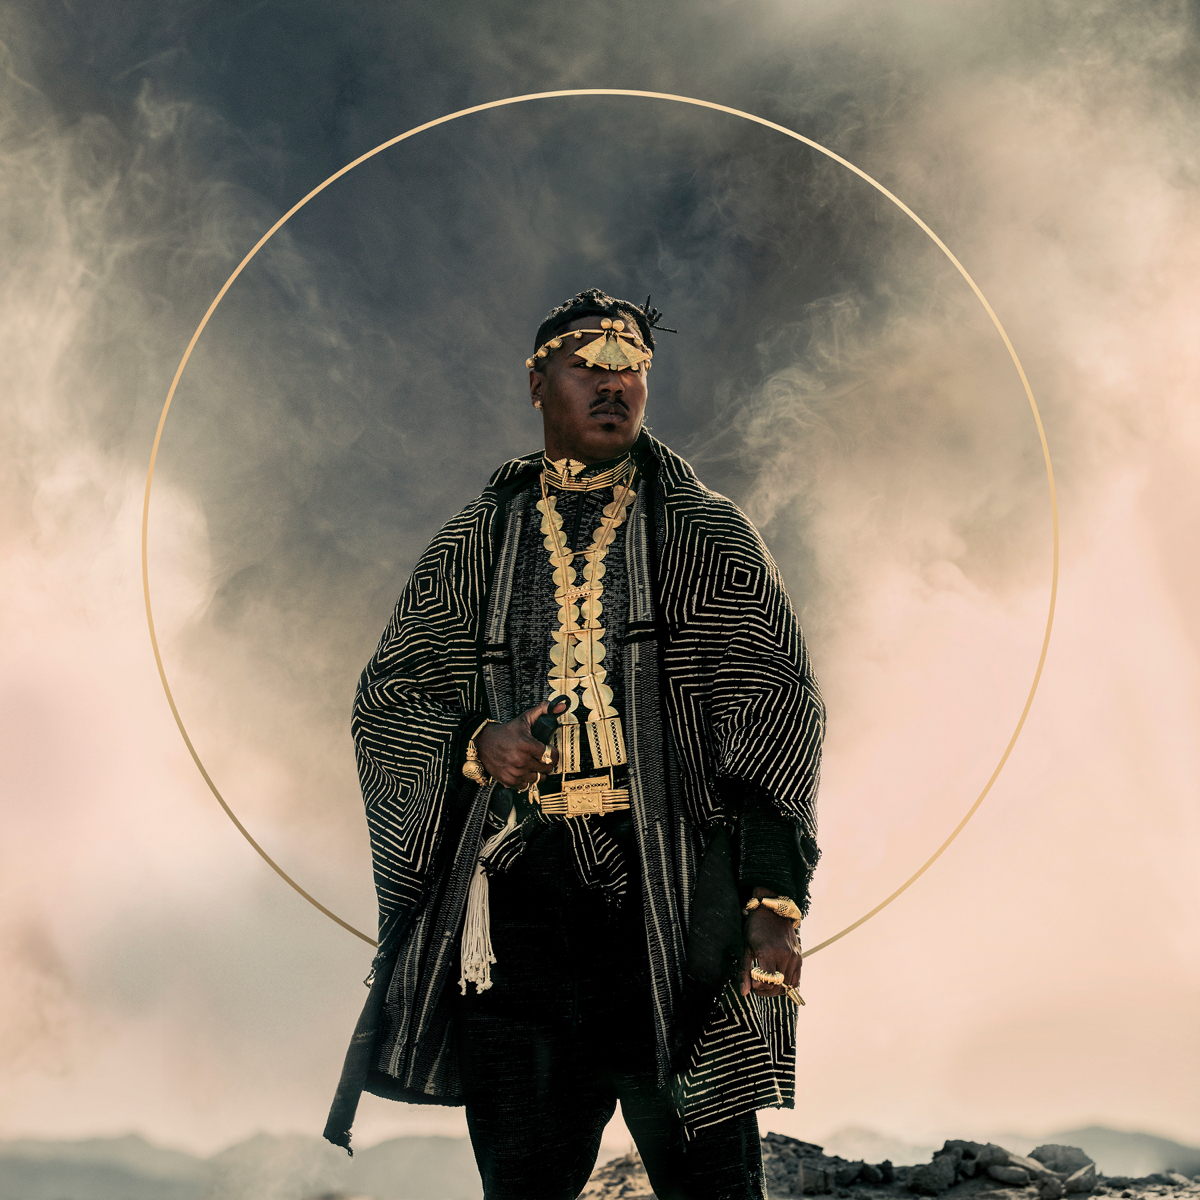 Christian-Scott-Atunde-Adjuah_AncestralRecall-Cover